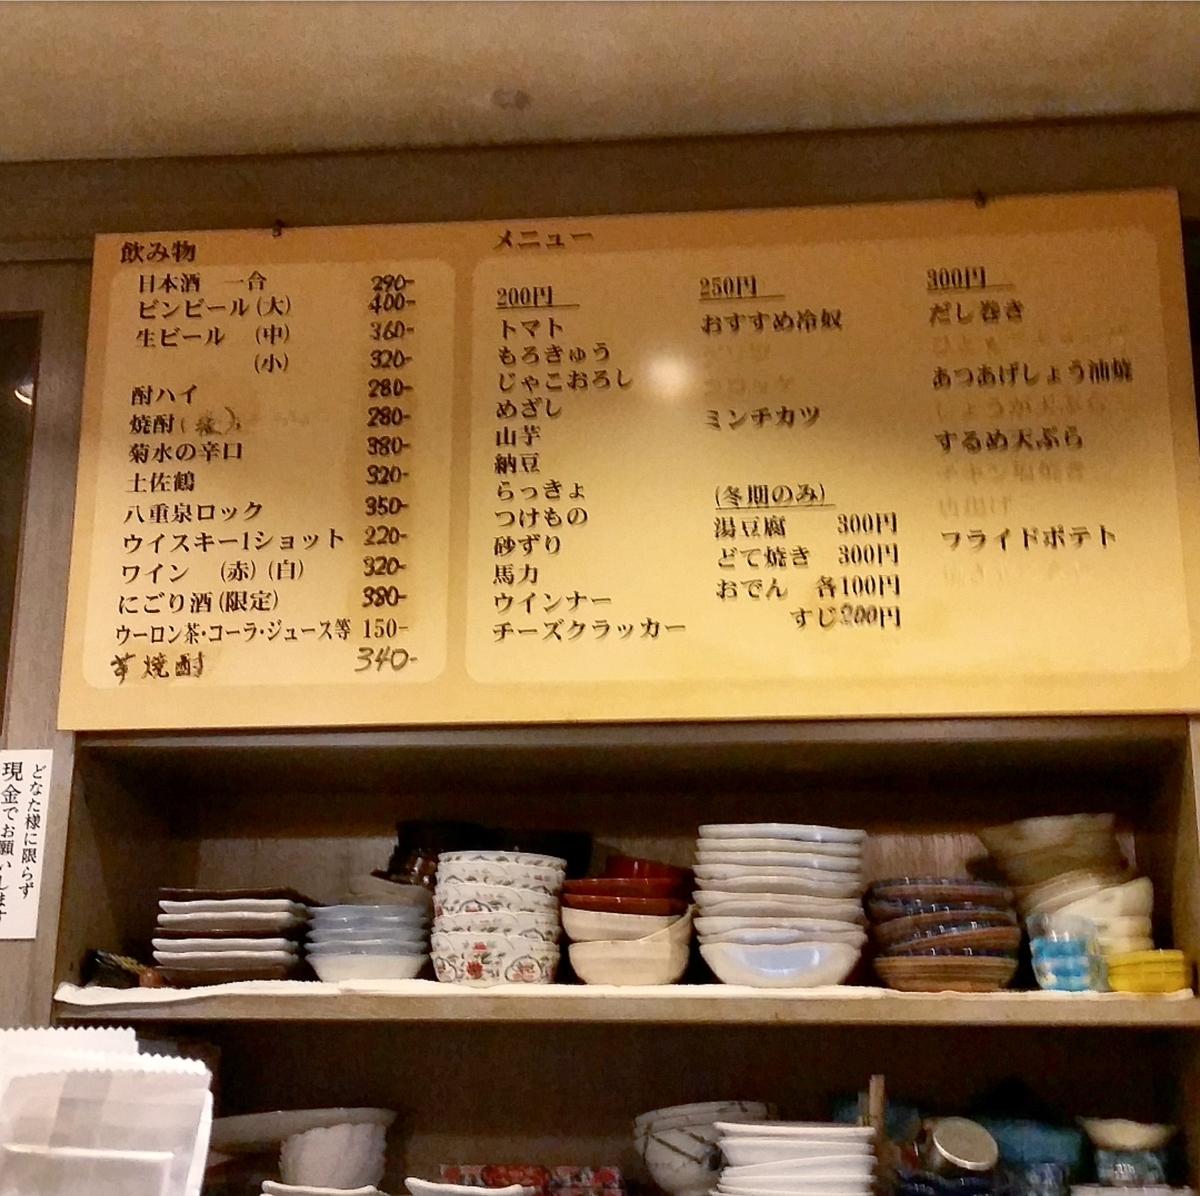 f:id:ichigo-ichie411211:20190410153133j:plain